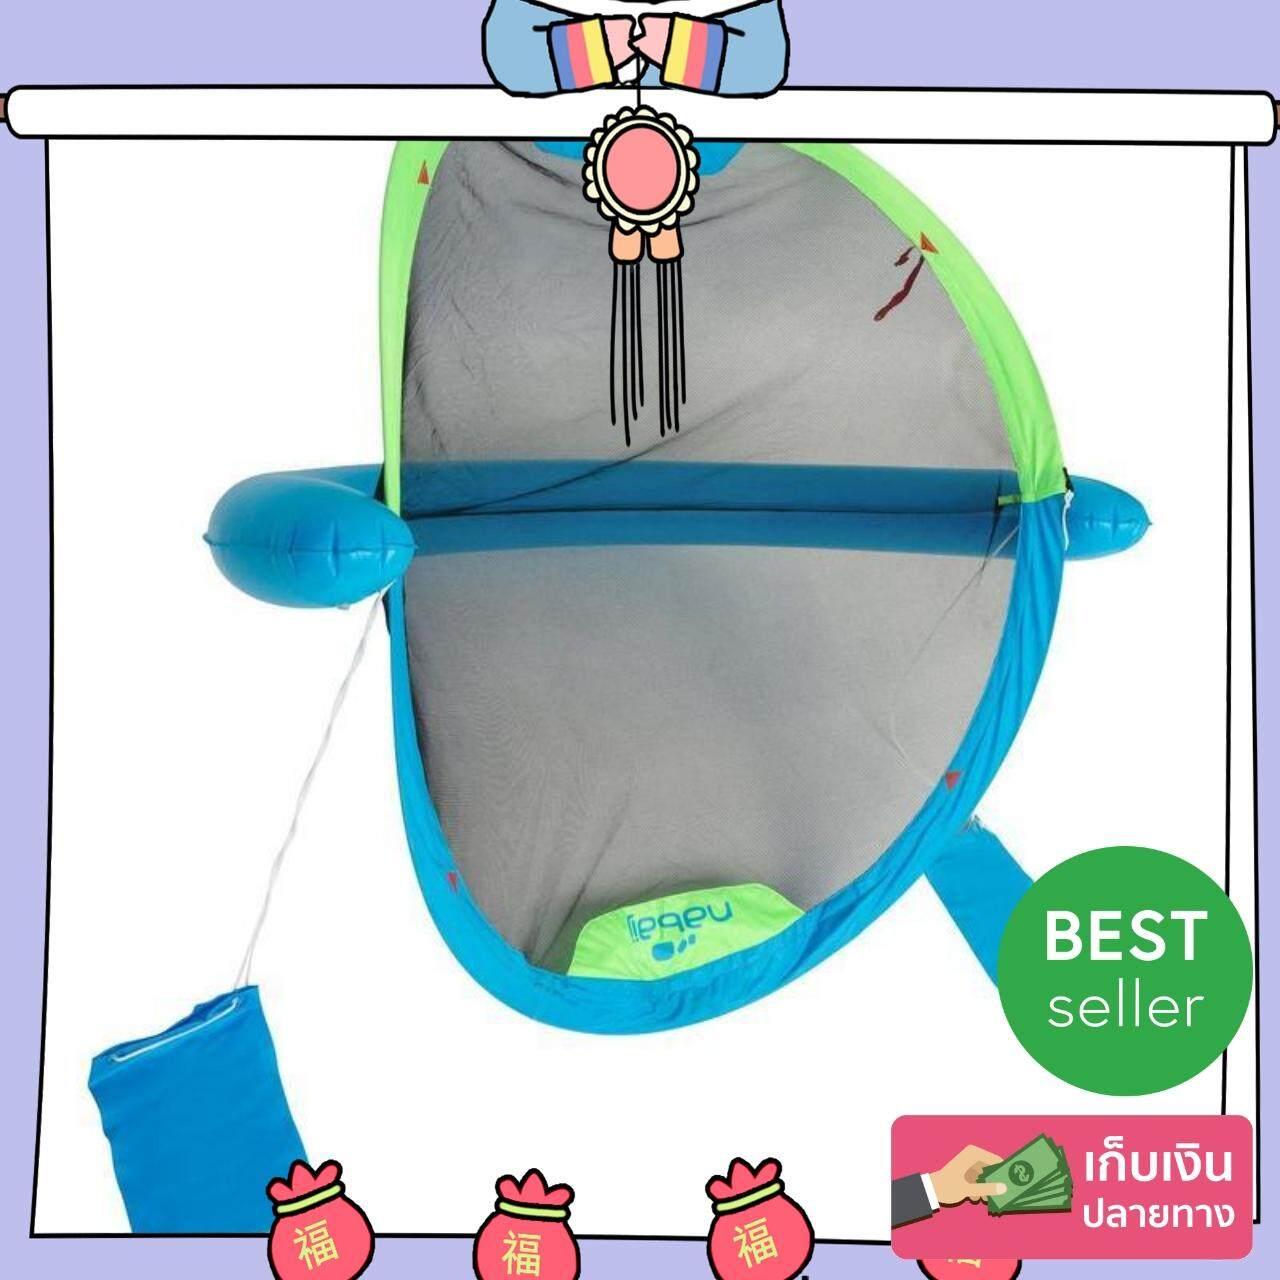 Speedtoday ประตูโปโลน้ำรุ่น Polo Up (สีฟ้า/เขียว) โปโลน้ำ ลูกบอล ประตูสำหรับเล่นในน้ำ หมวกโปโลน้ำ ชุด ดํา น้ํา ตก ปลา กีฬาทางน้ำ สยาม กีฬา ว่ายน้ำ วอลเล่บอล ชุด ว่า ย น้ำ สระ ว่า ย น้ำ กางเกง ว่า ย น้ำ ของแท้ 100% ราคาถูก